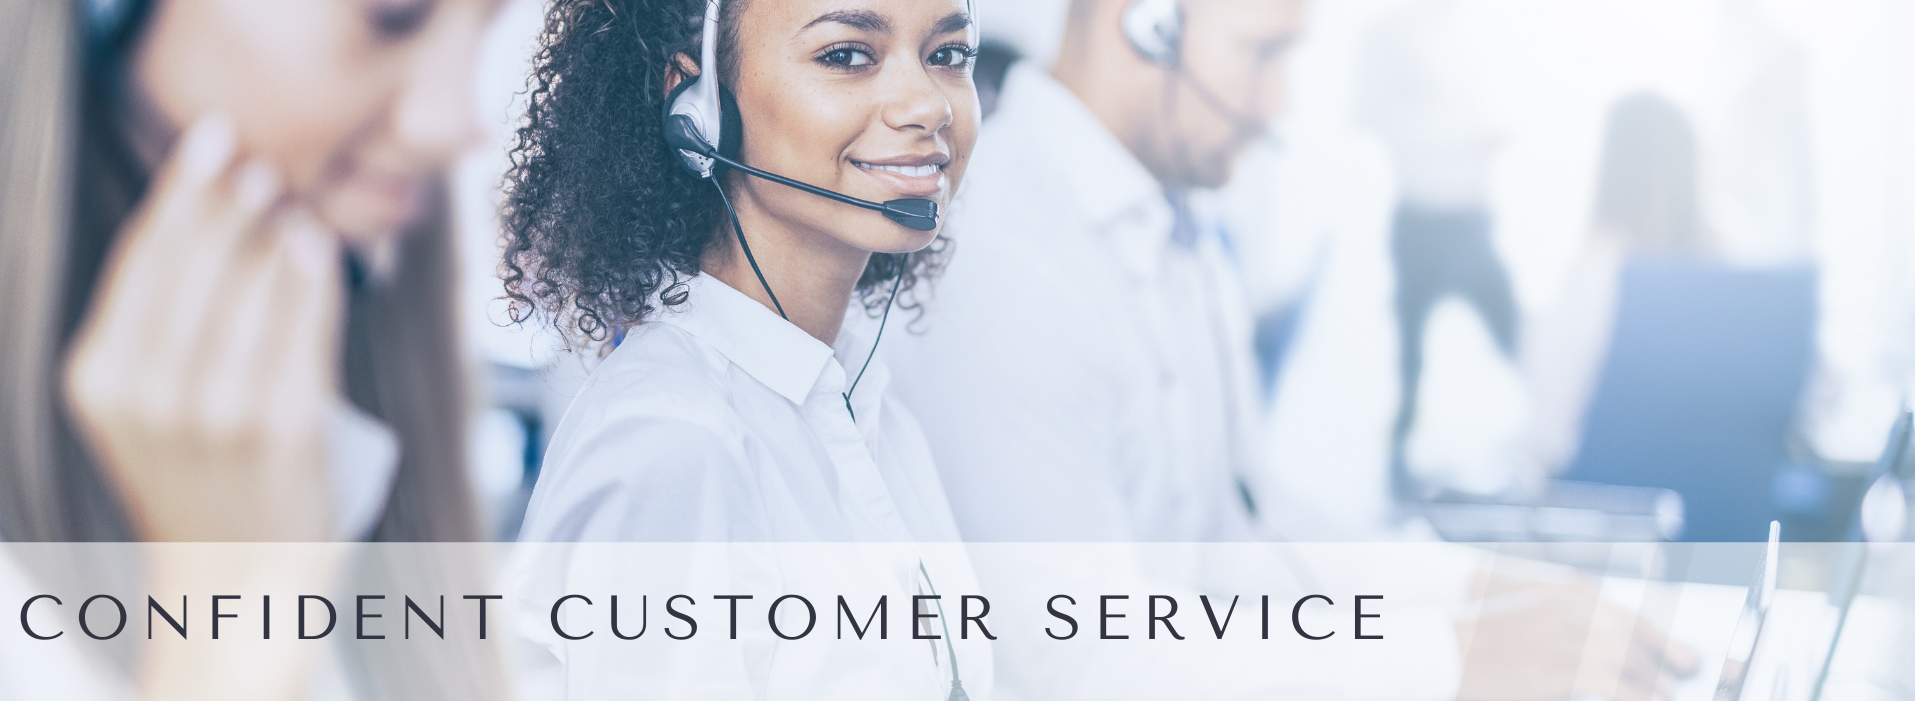 Confident customer service course outline 2 eurika northamptonshire, buckinghamshire, london, warwickshire, leicestershire